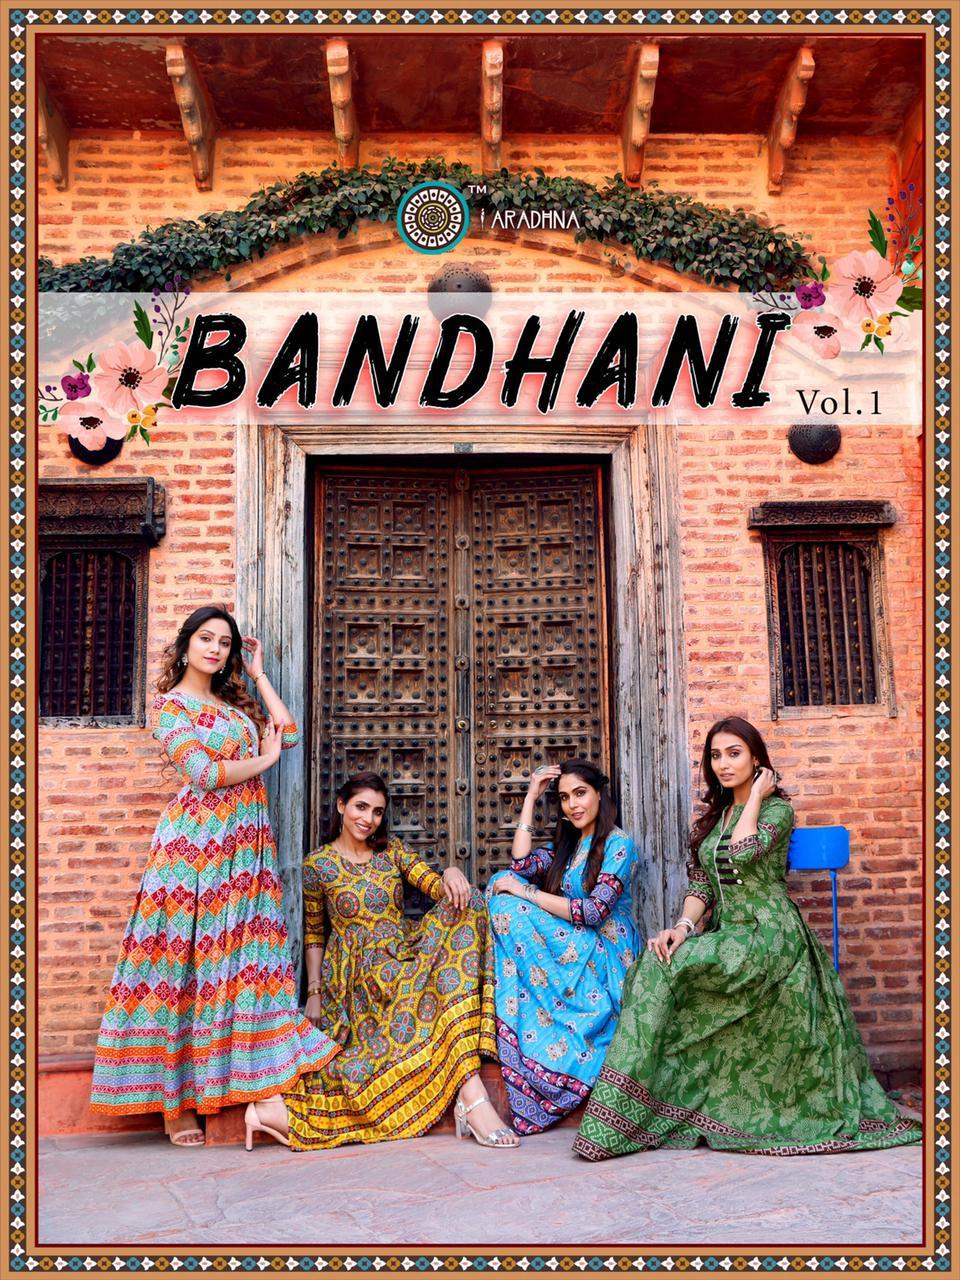 Aradhna Bandhani Vol 1 Kurti Wholesale Catalog 10 Pcs 5 - Aradhna Bandhani Vol 1 Kurti Wholesale Catalog 10 Pcs